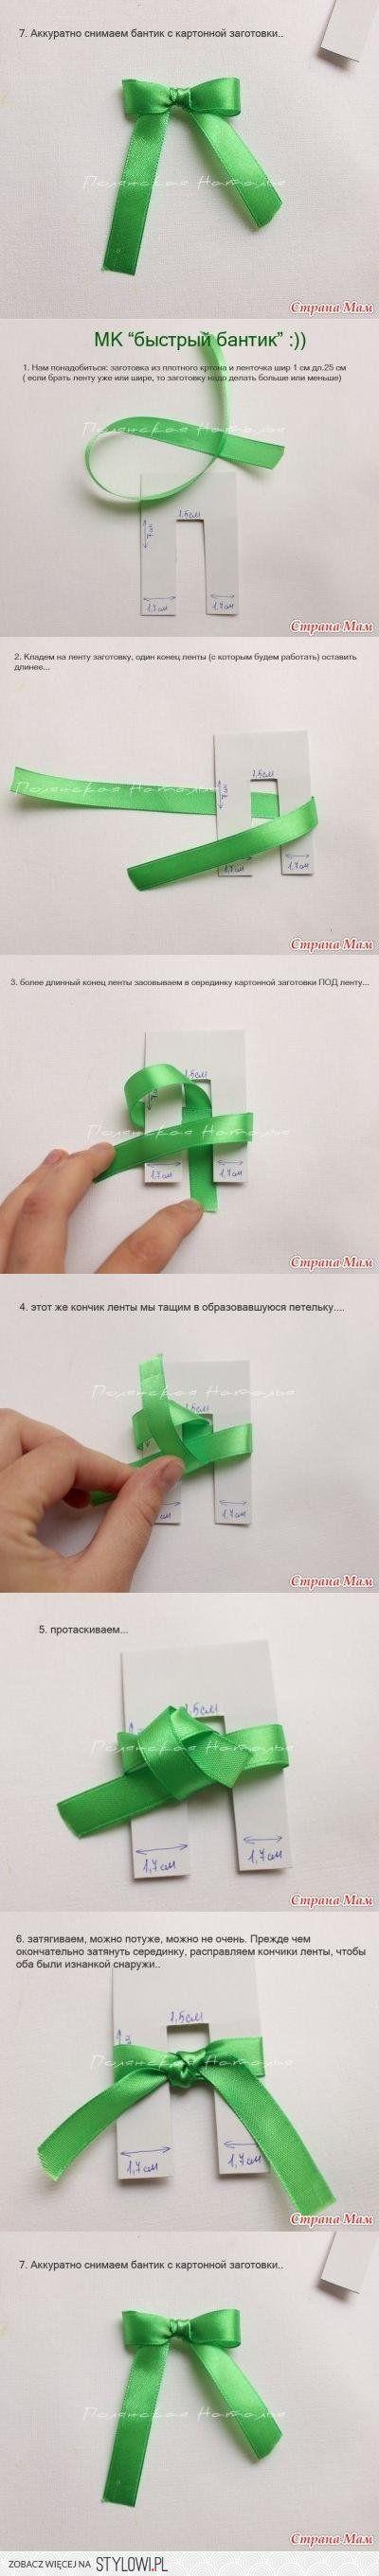 DIY Easy Ribbon Bow DIY Projects   UsefulDIY.com na Stylowi.pl